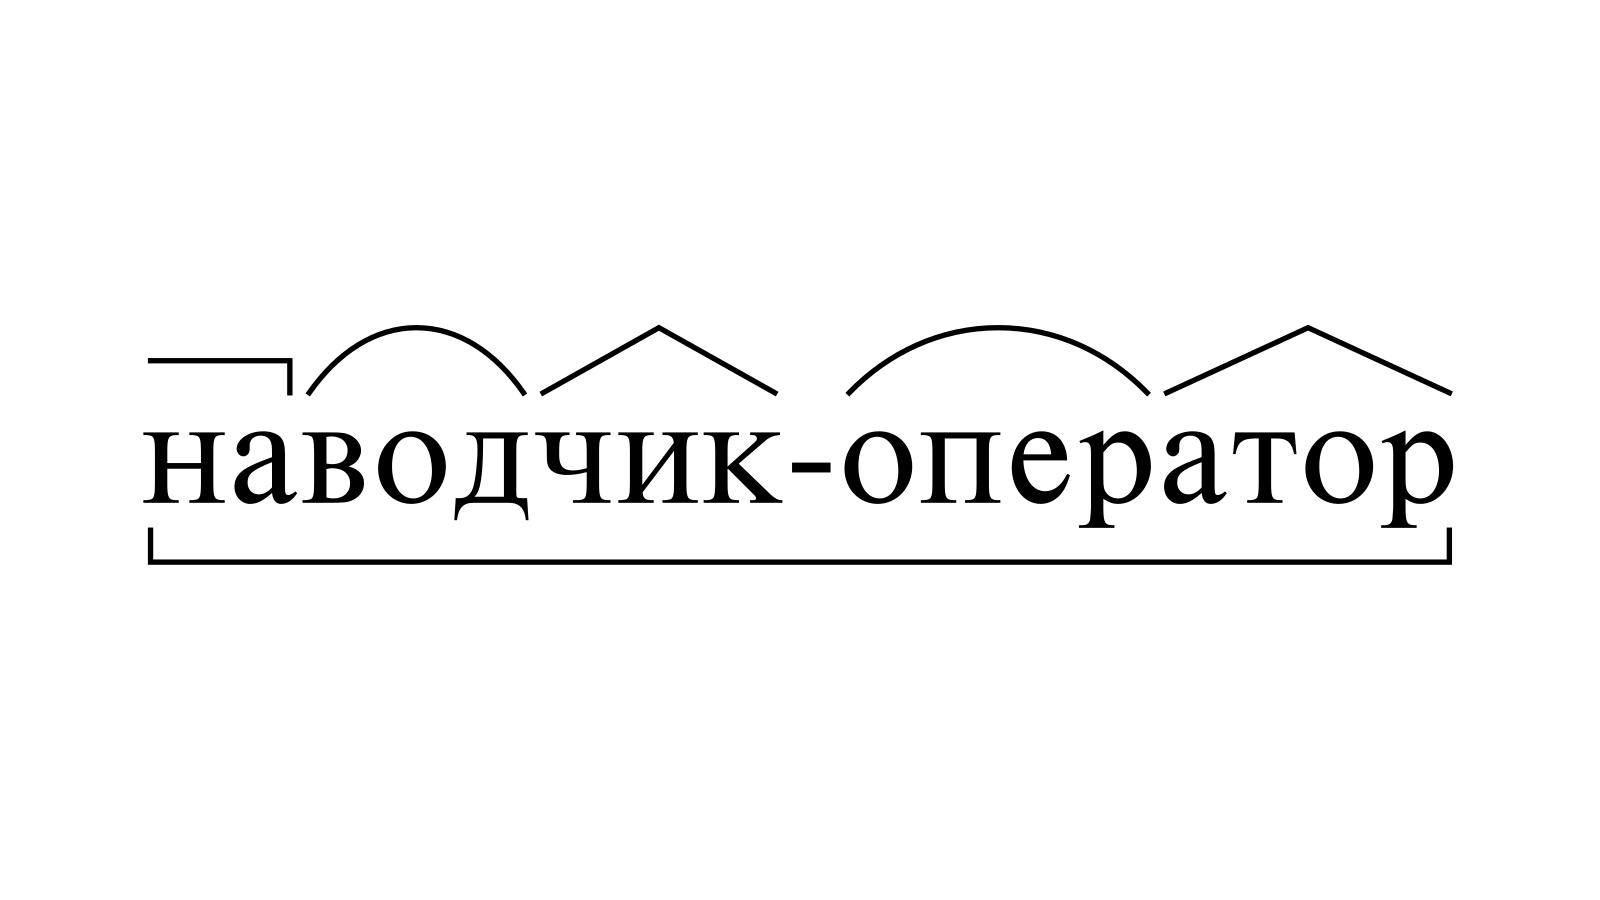 Разбор слова «наводчик-оператор» по составу